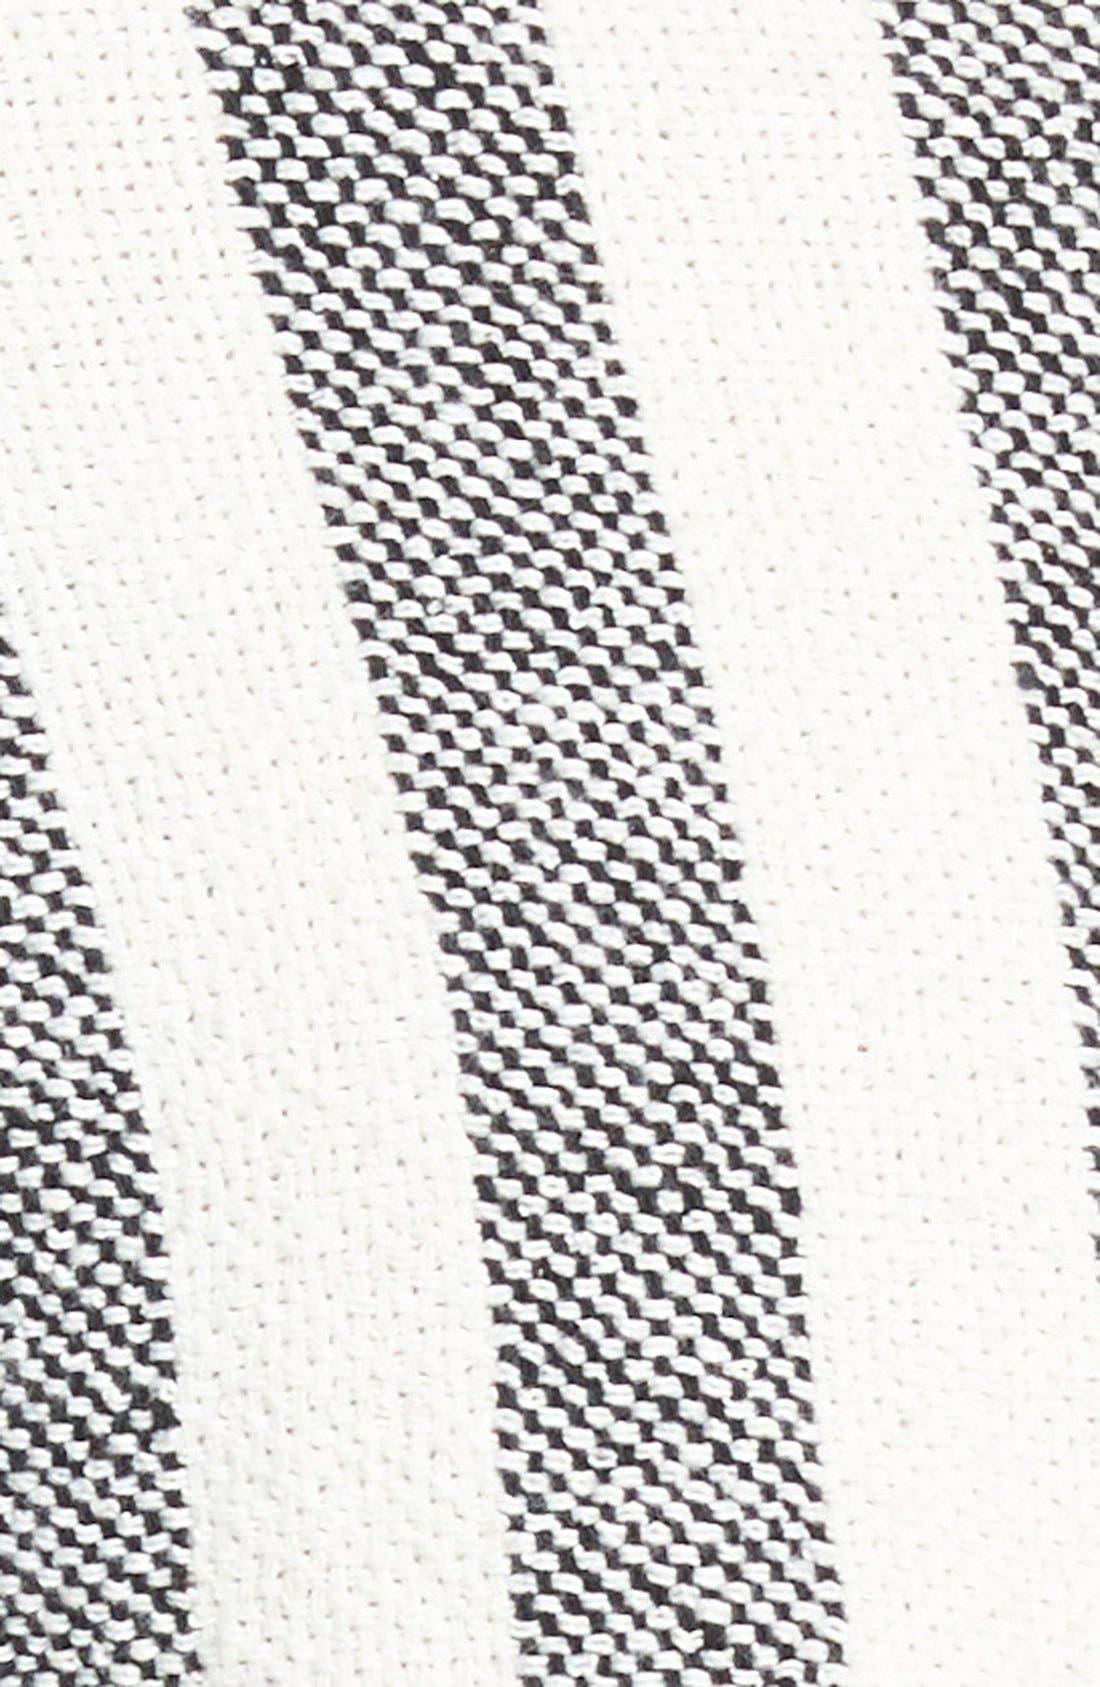 'Marooned' High Waist Woven Shorts,                             Alternate thumbnail 4, color,                             900